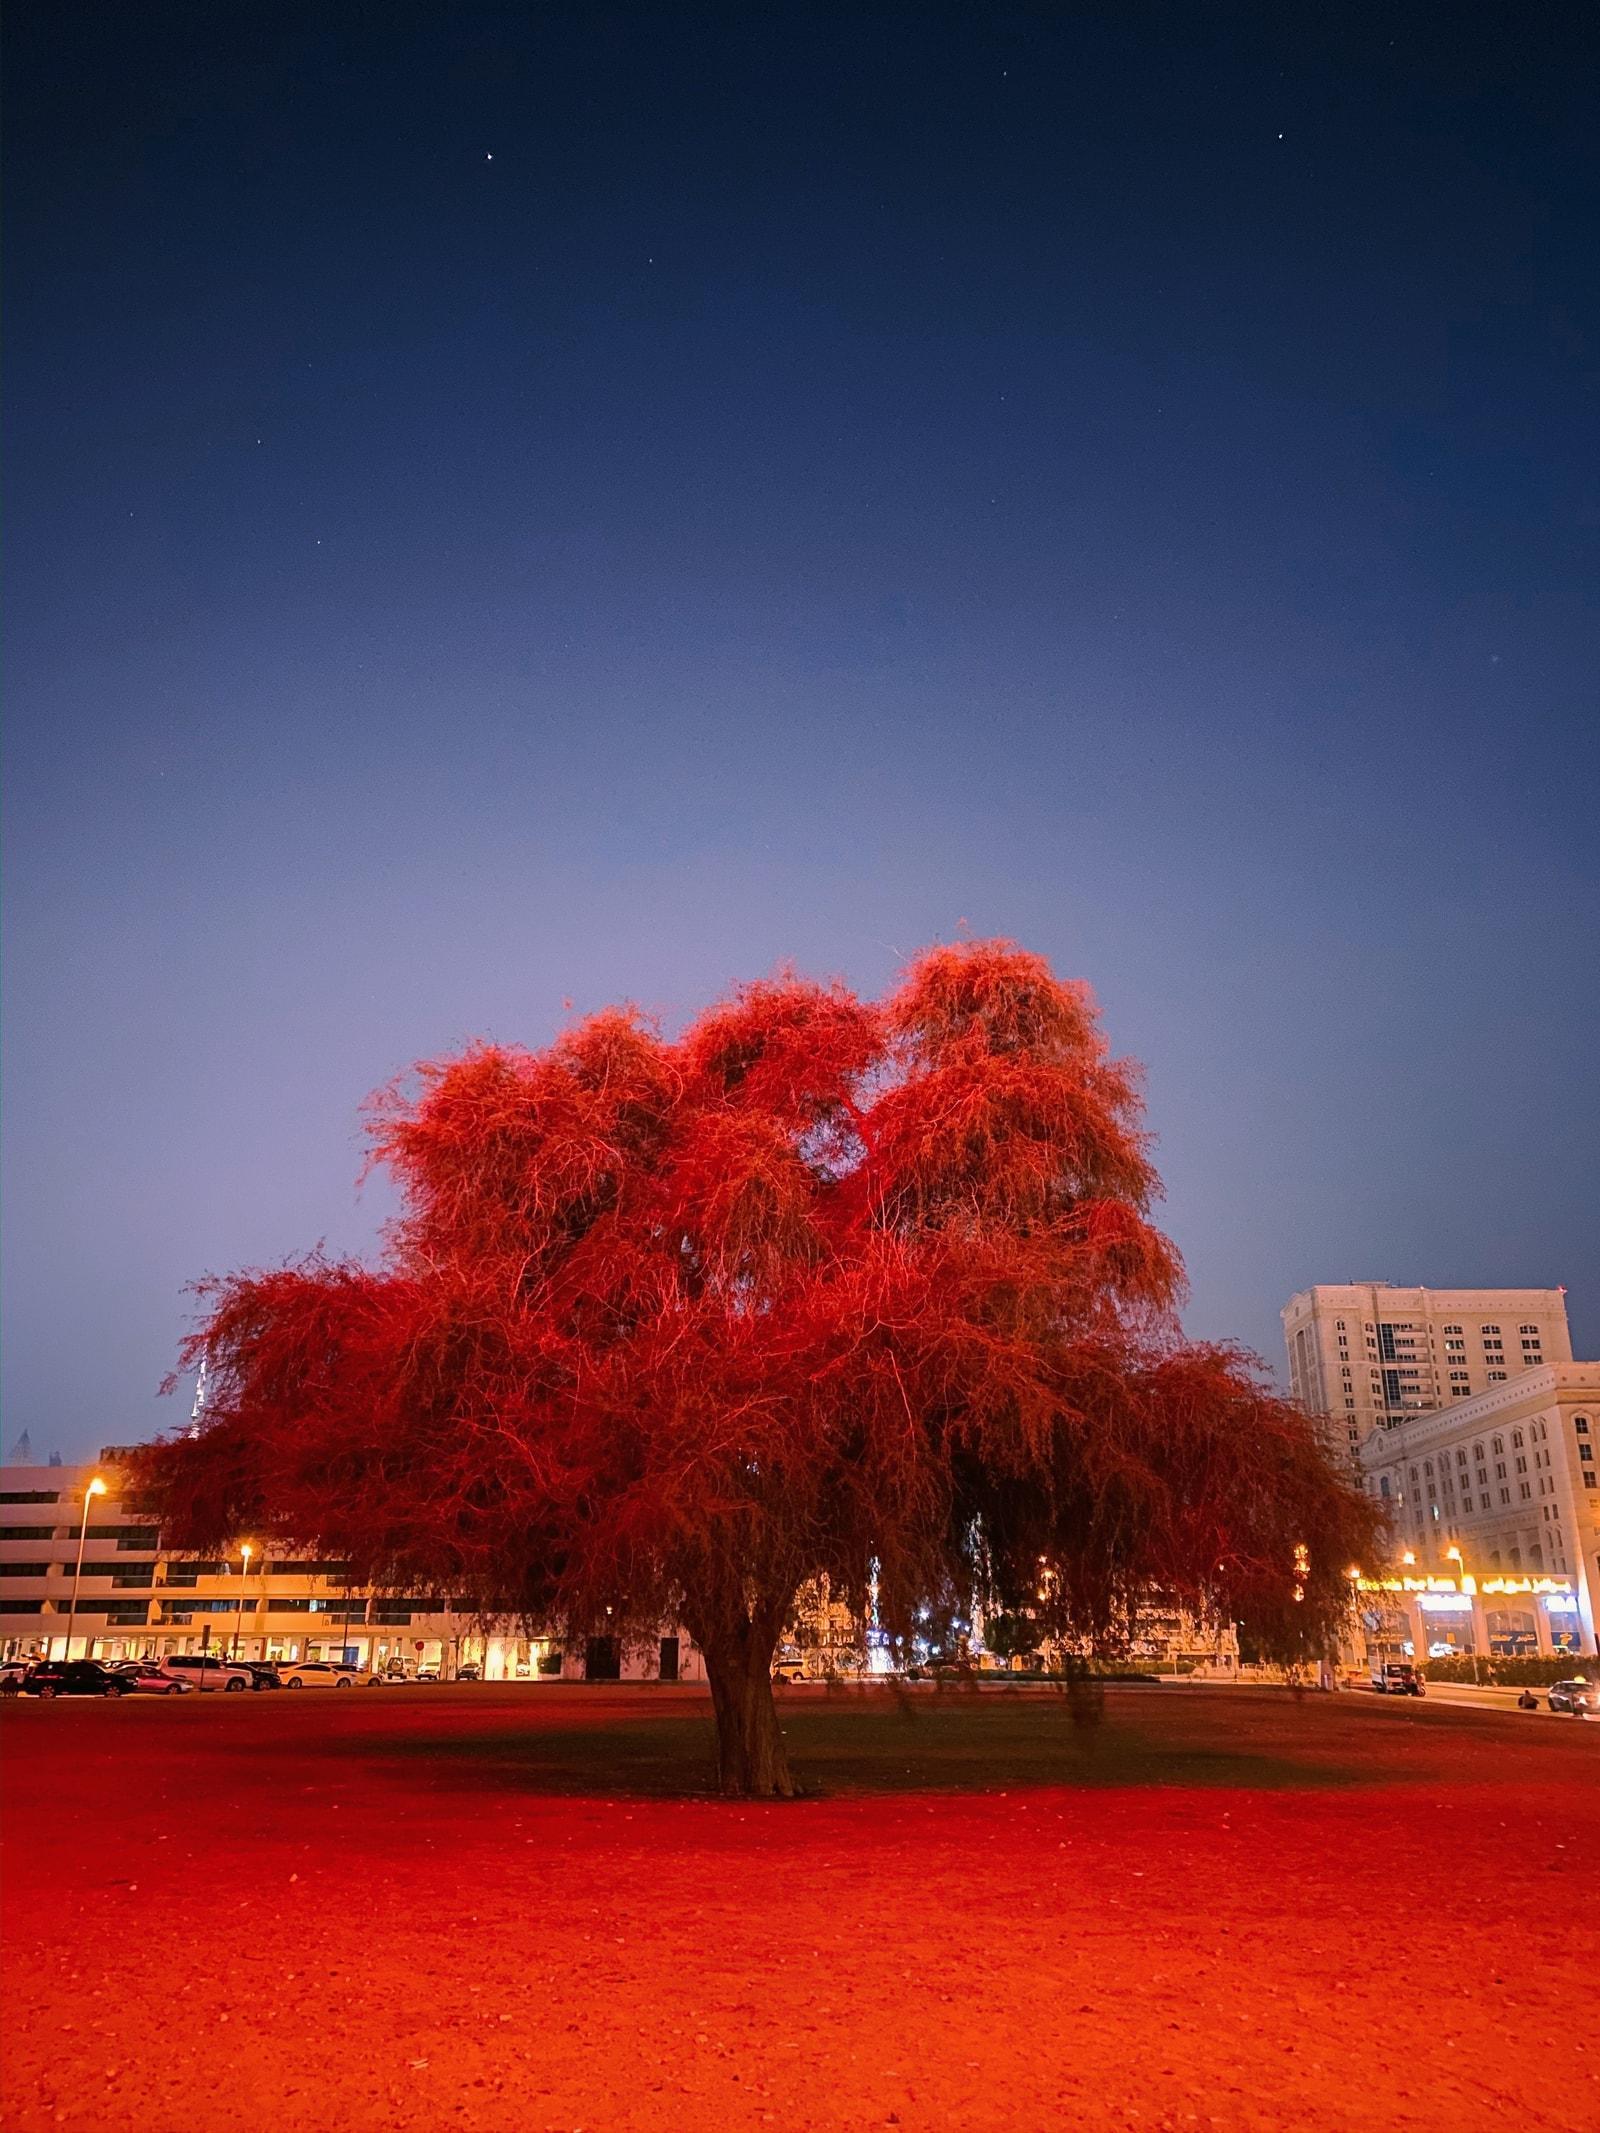 iPhone「夜間模式」攝影大賽中國得獎者 Eric Zhang 與我們分享作品背後的故事及攝影小技巧